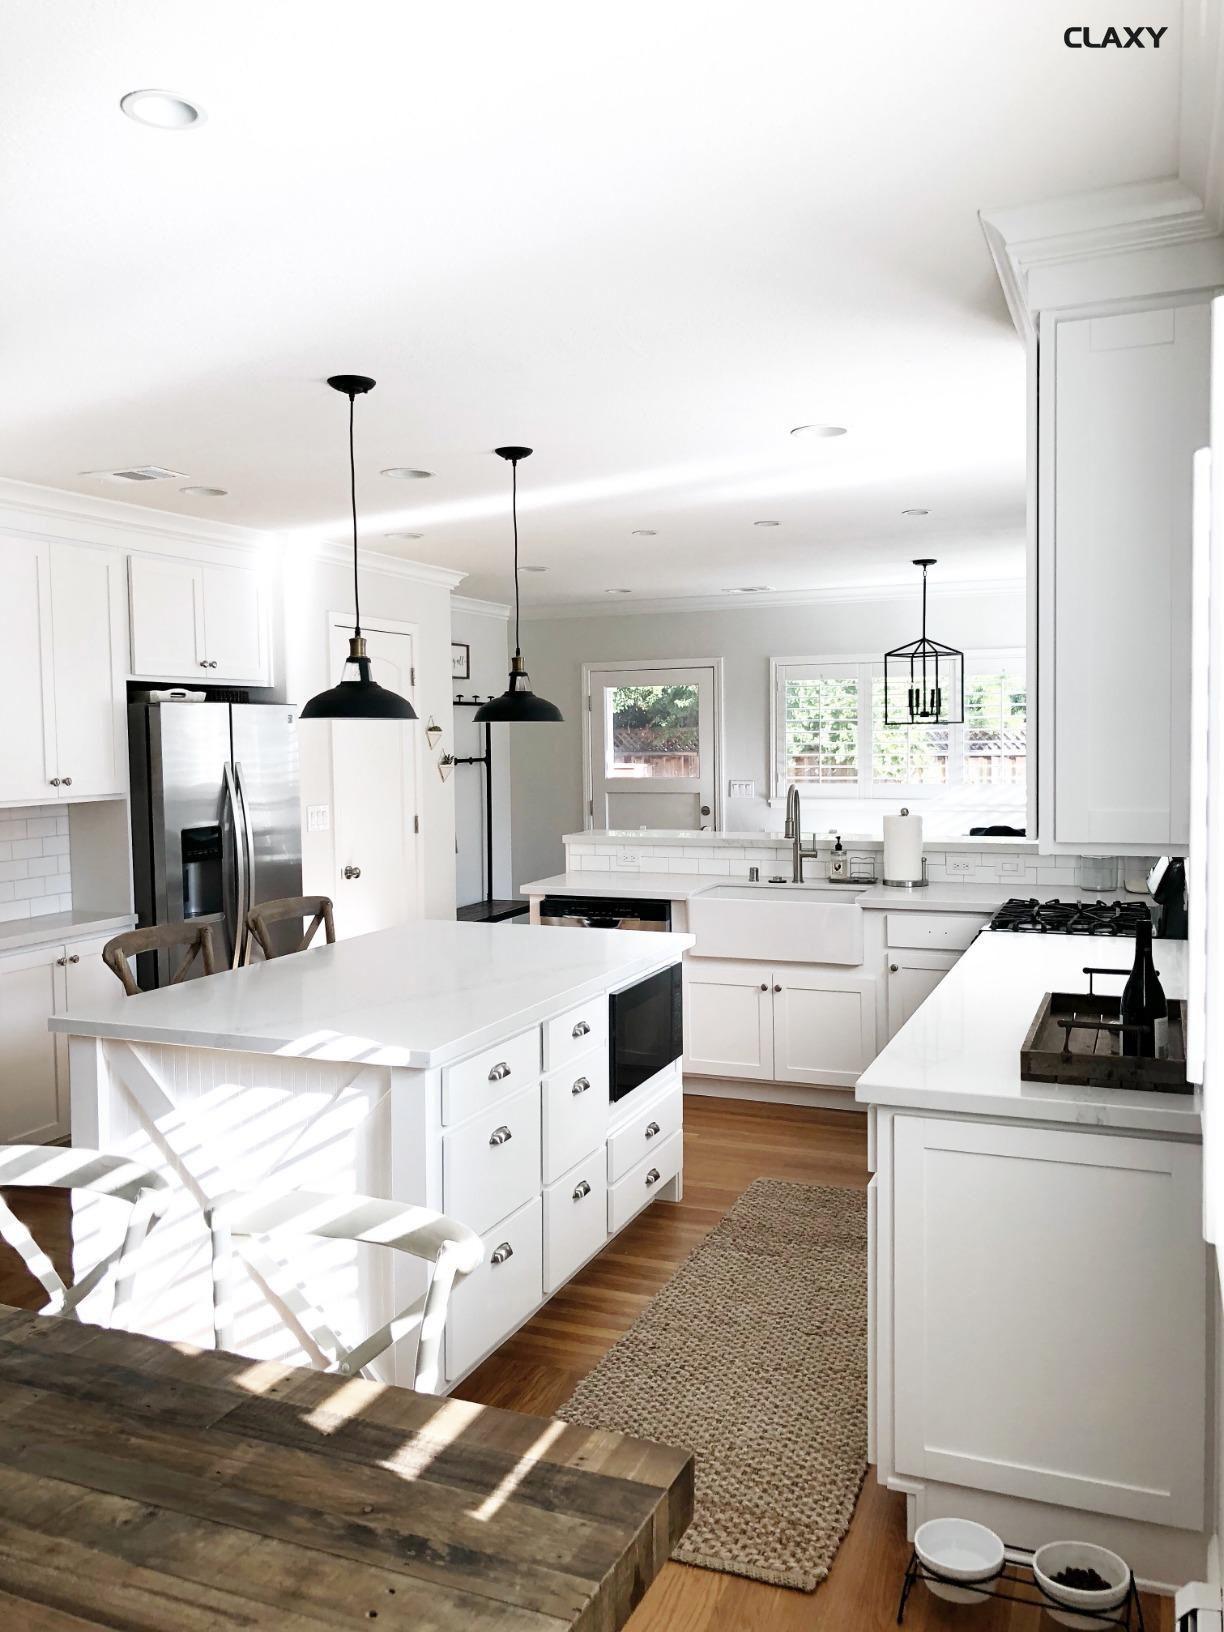 Contemporary Kitchen Interior Design: Modern Farmhouse White Kitchen With Black Fixtures And